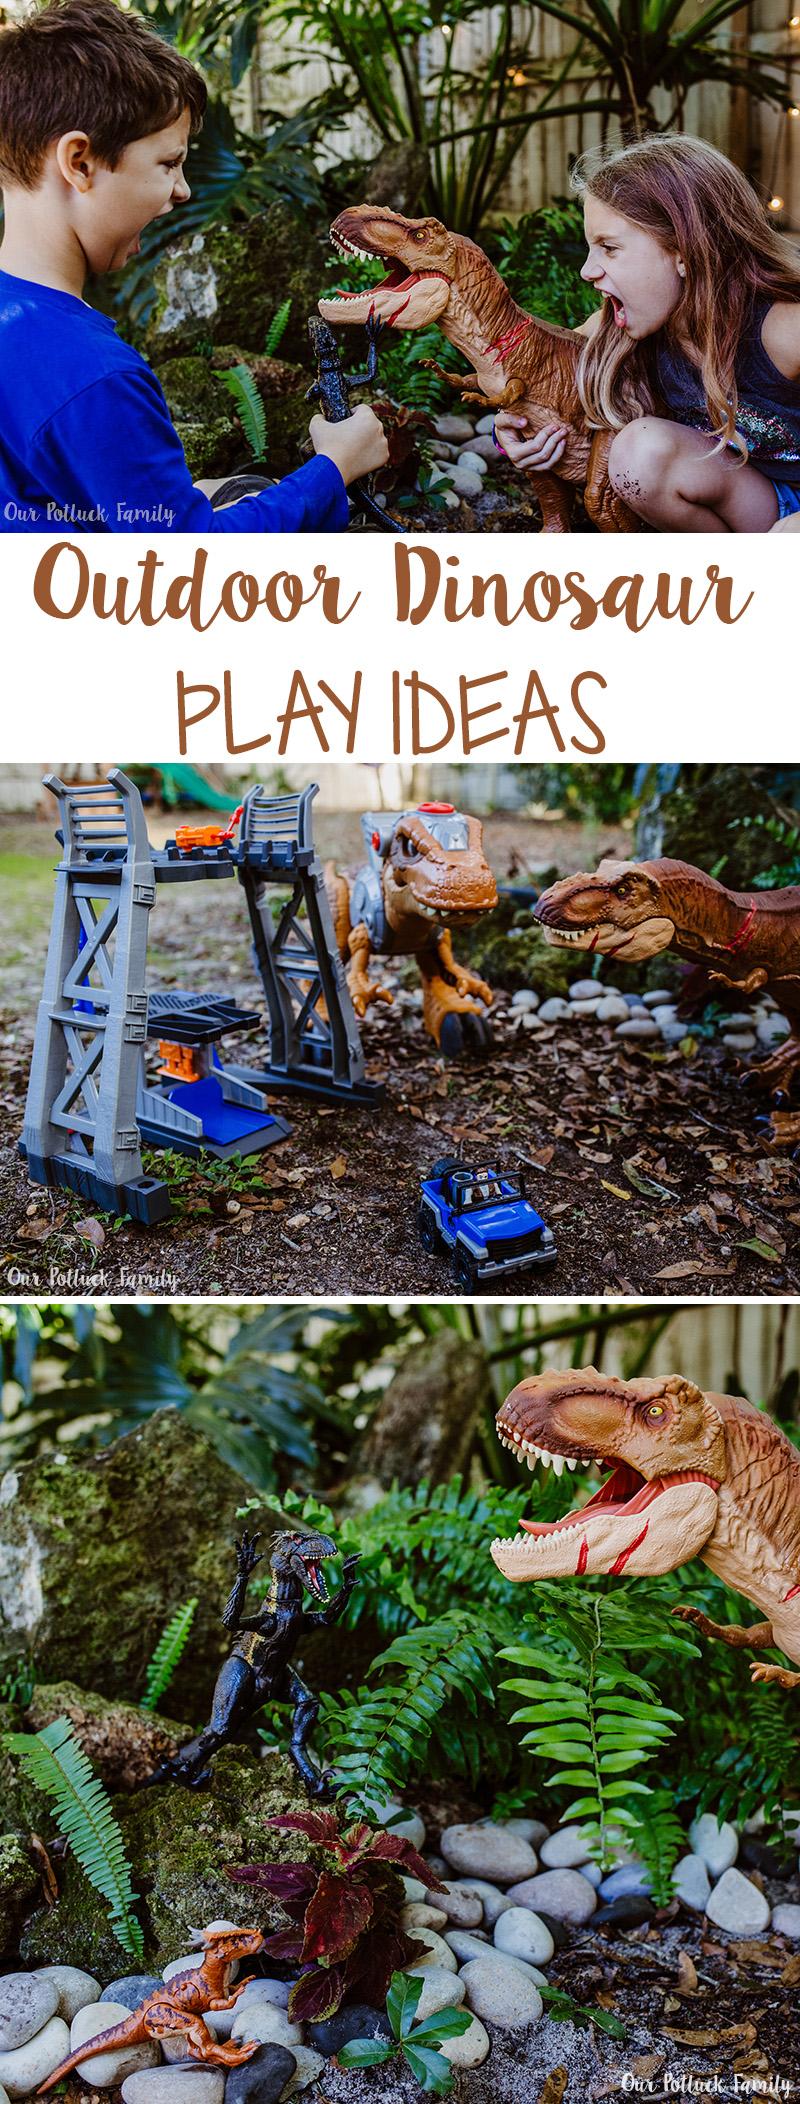 Outdoor Dinosaur Play Ideas